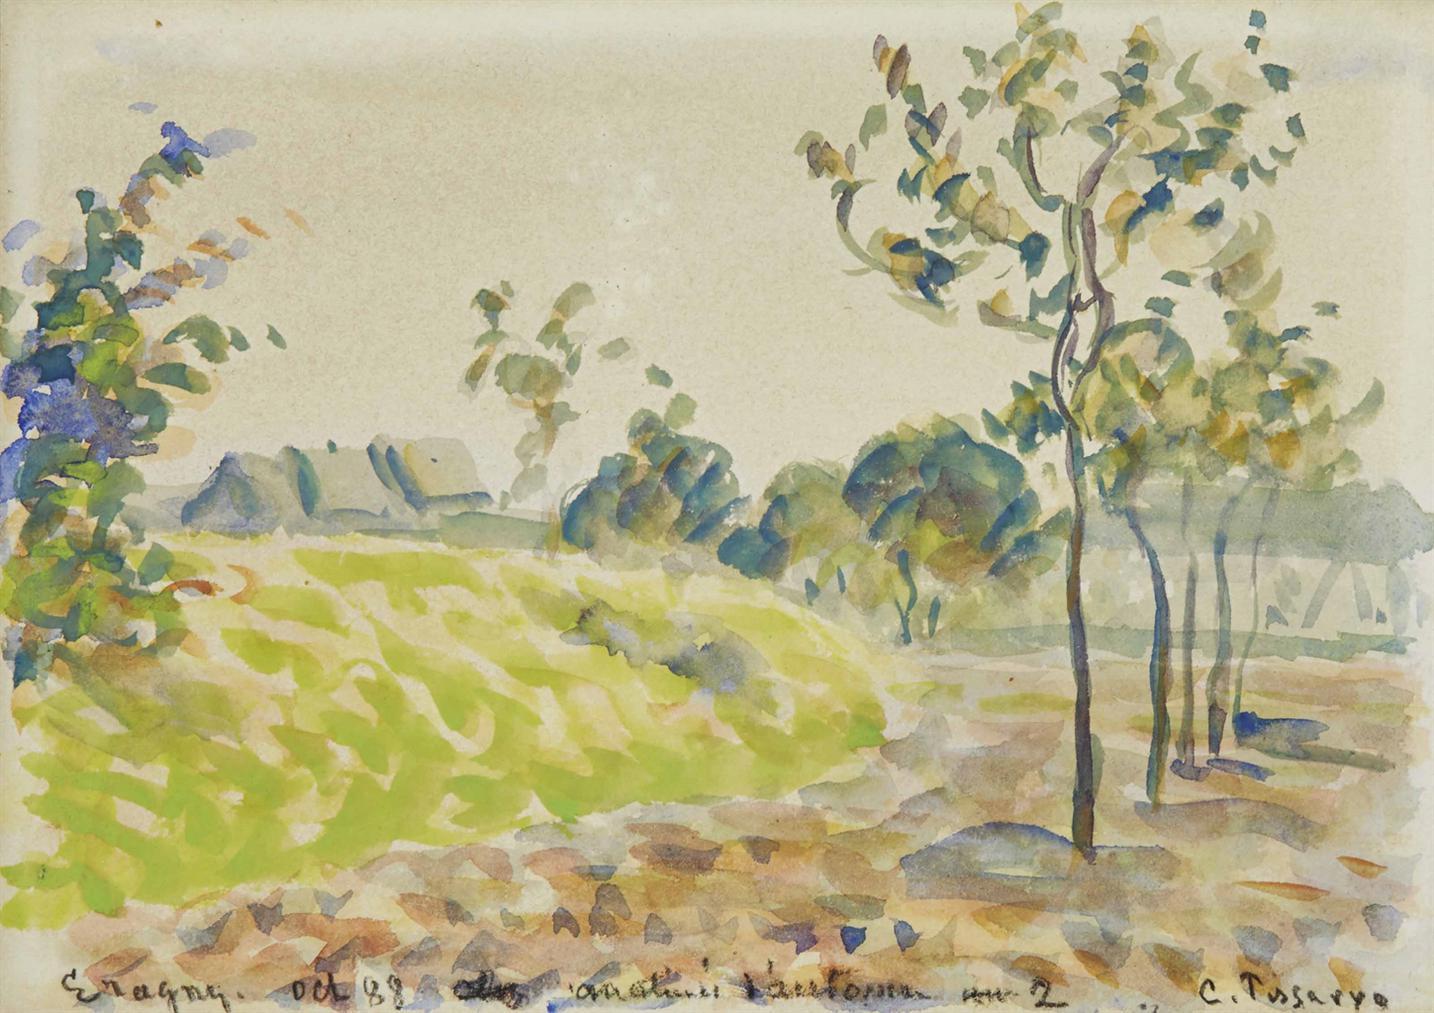 Camille Pissarro-Matinee Dautomne A Eragny-1888